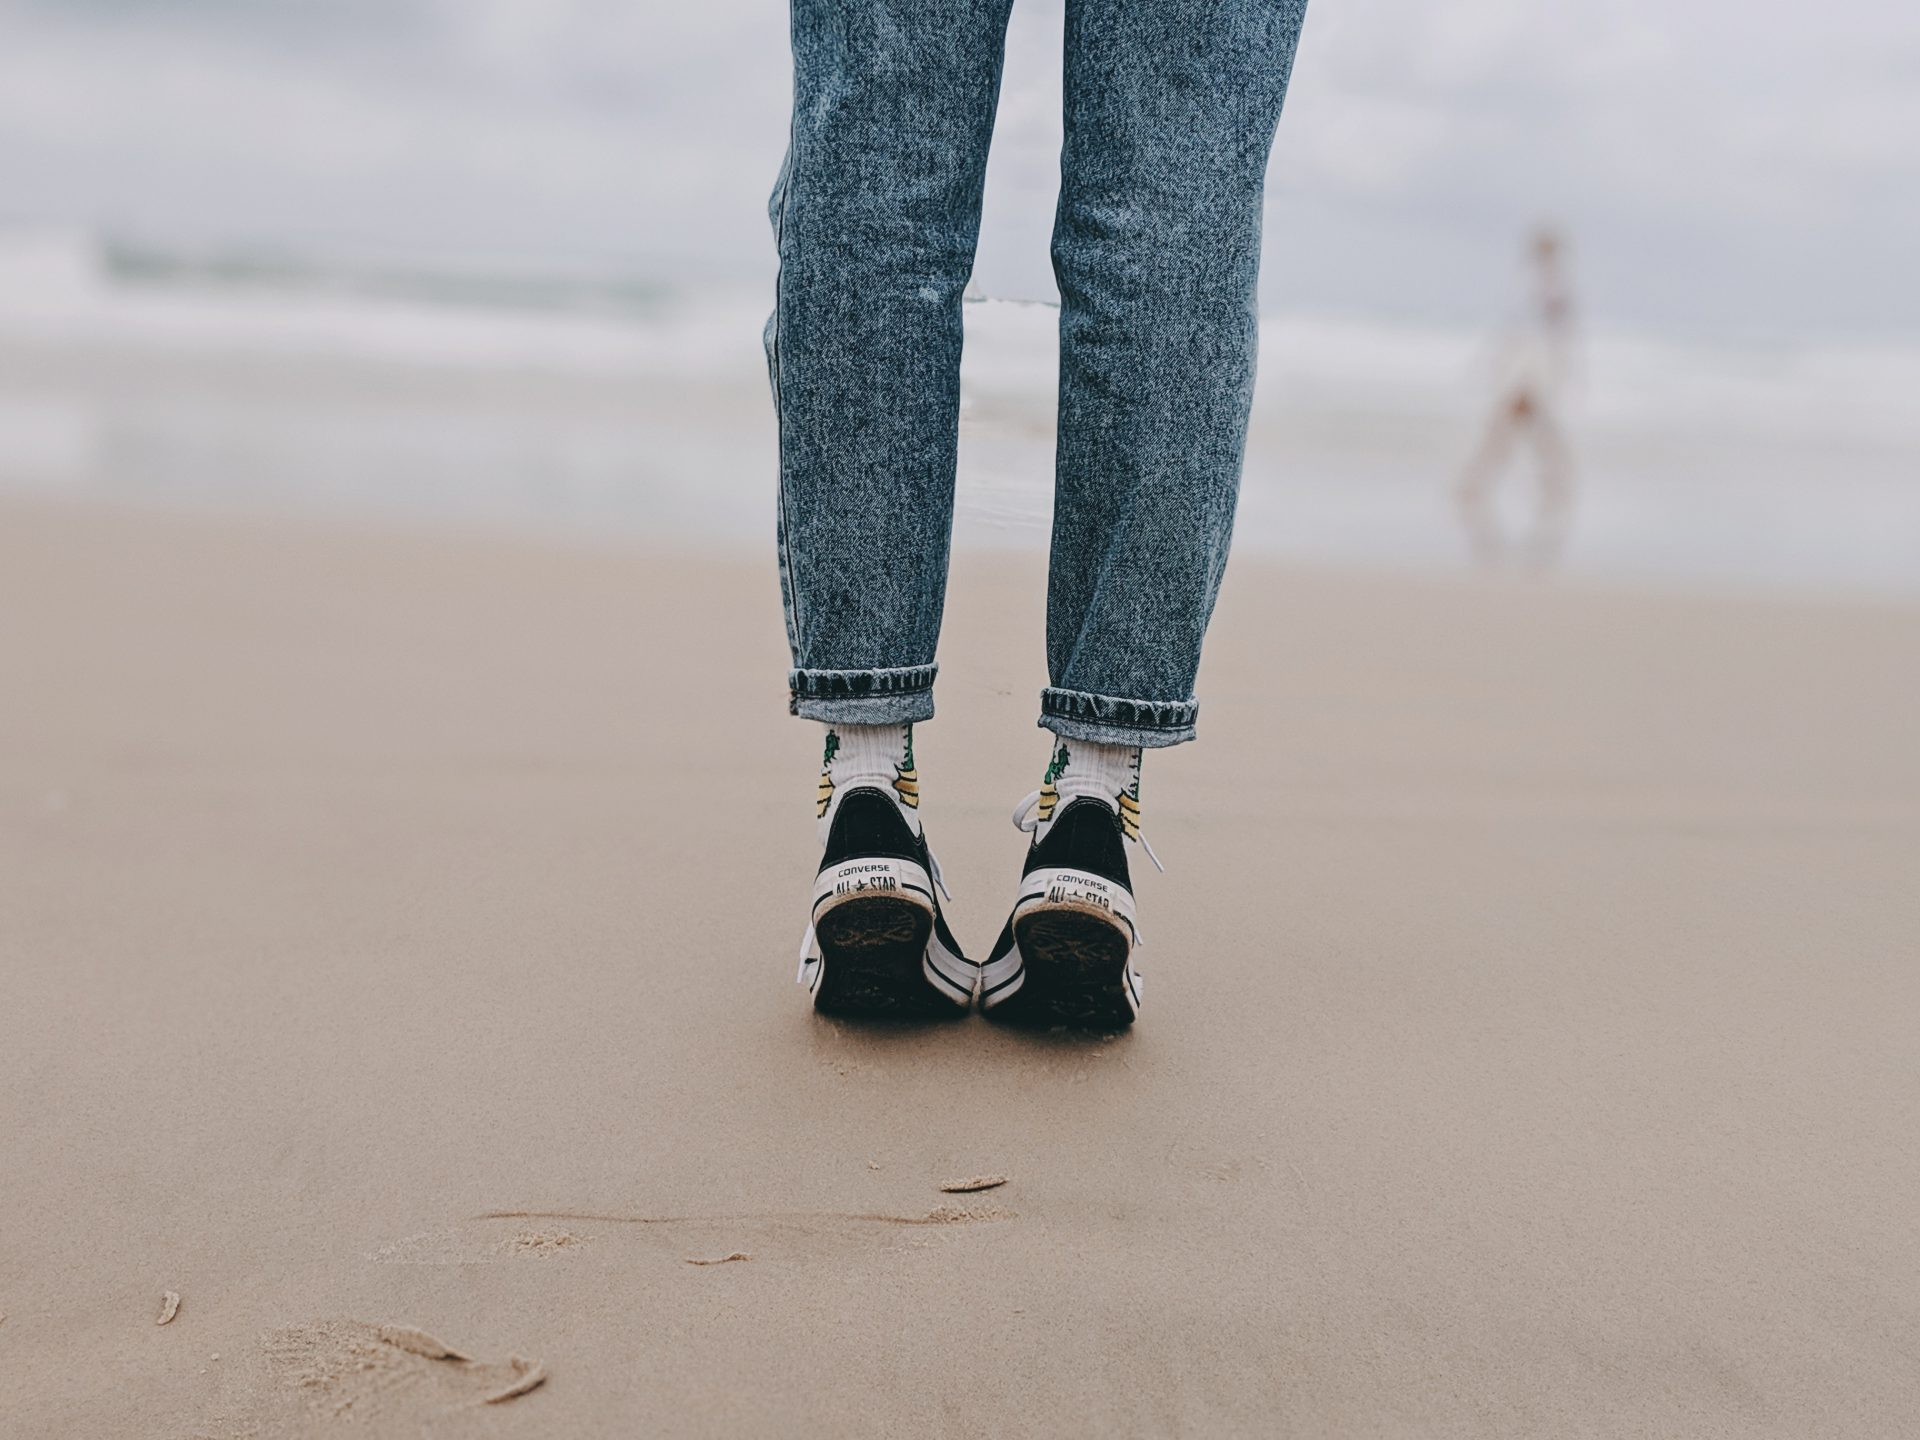 standing on tiptoes